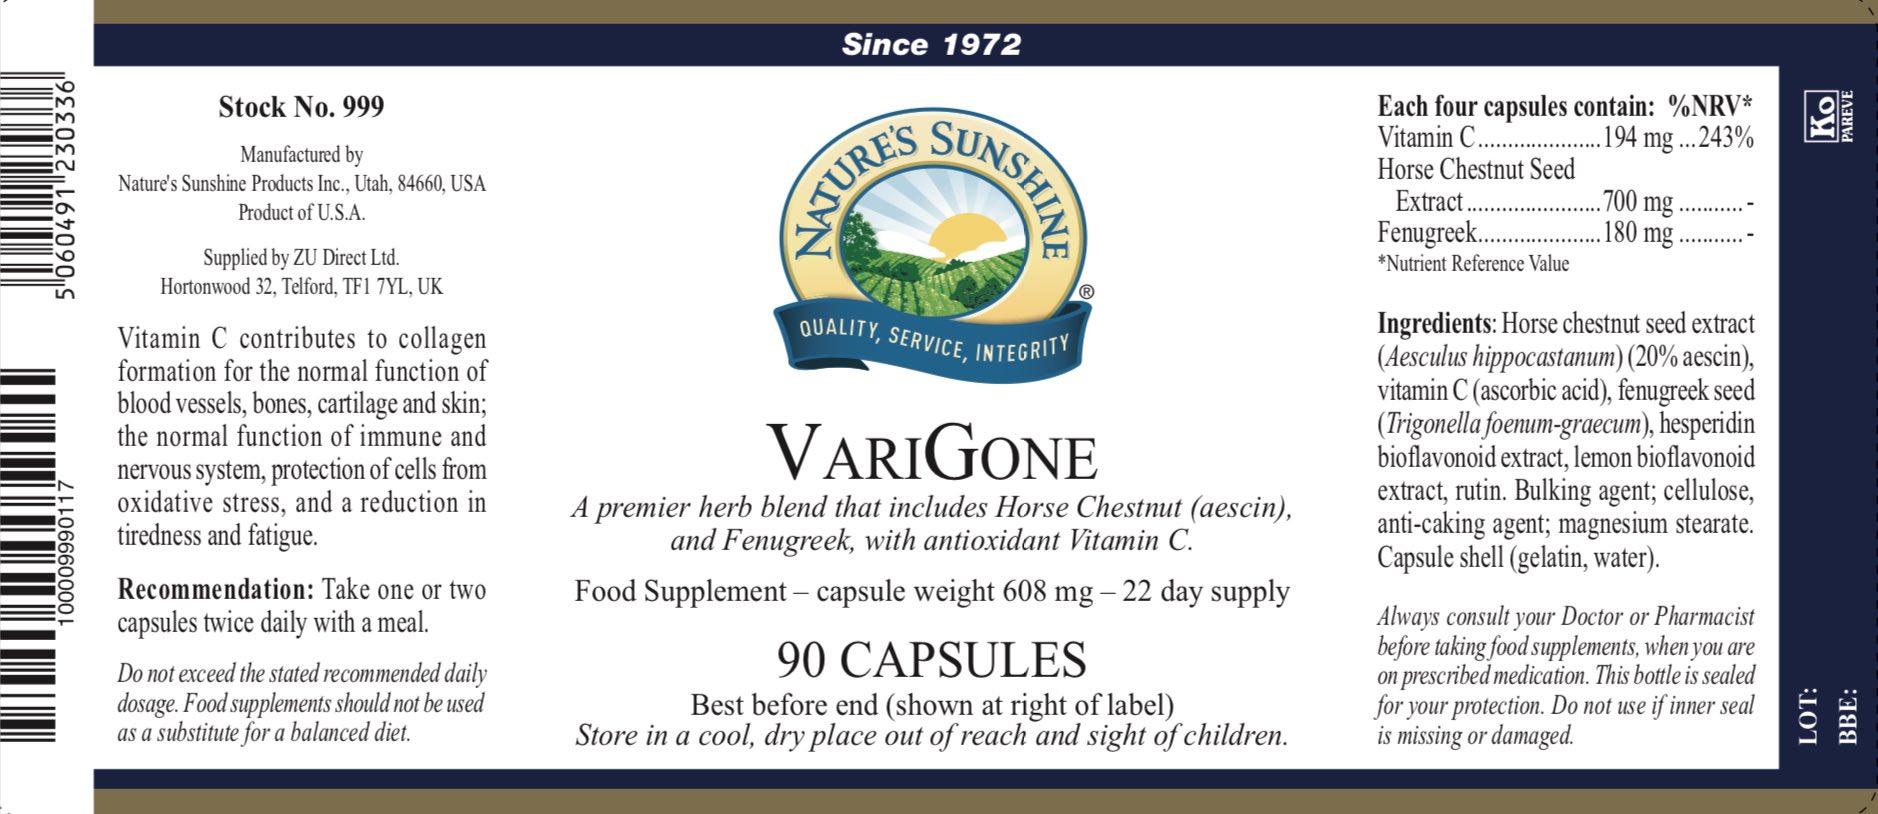 Nature's Sunshine - VariGone - Label